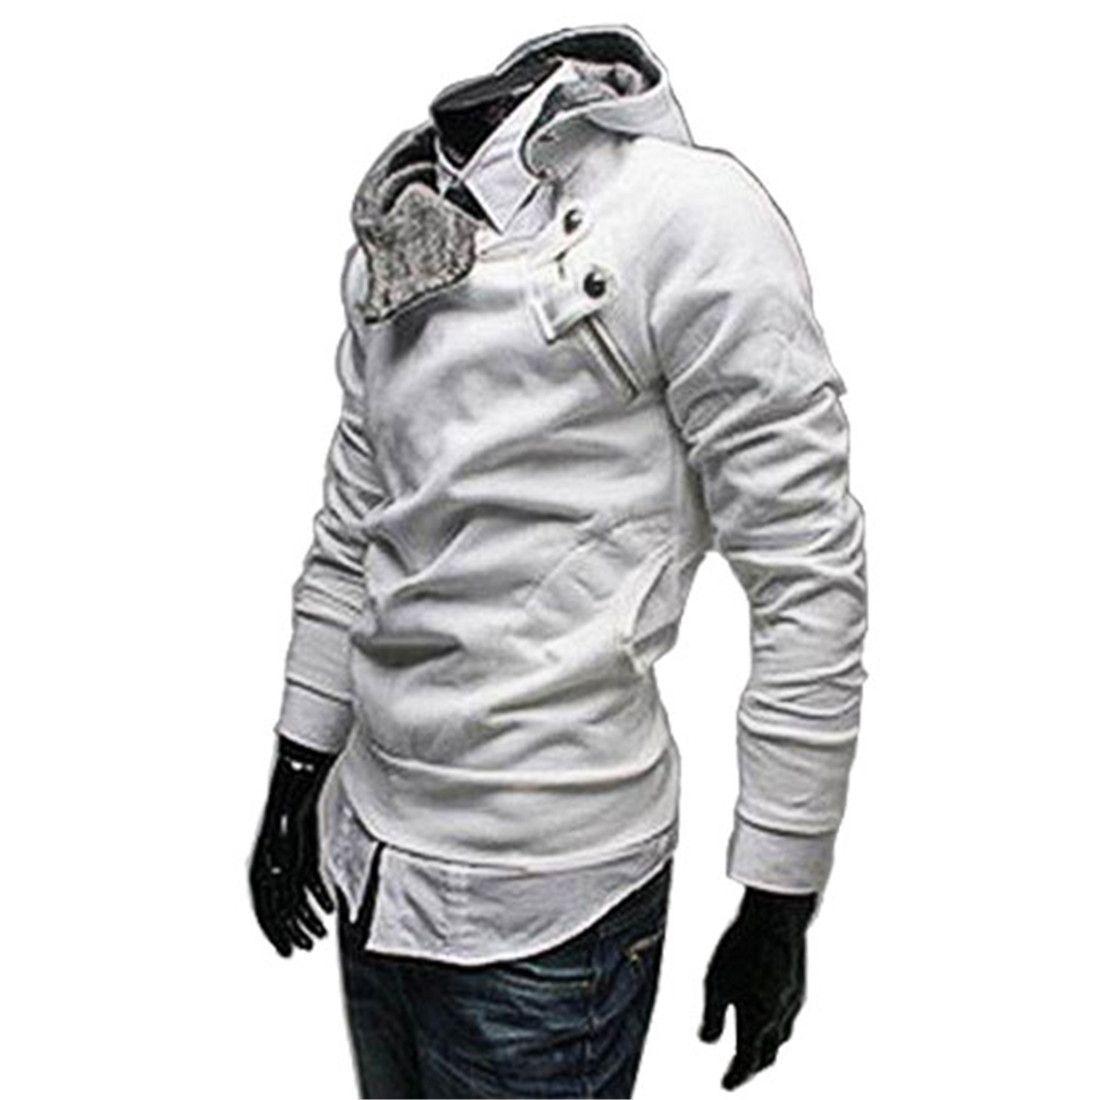 7cfc71236fec Generic Fashion Diagonal Zip Men   Fleece Hoodie Sweatshirts White 38